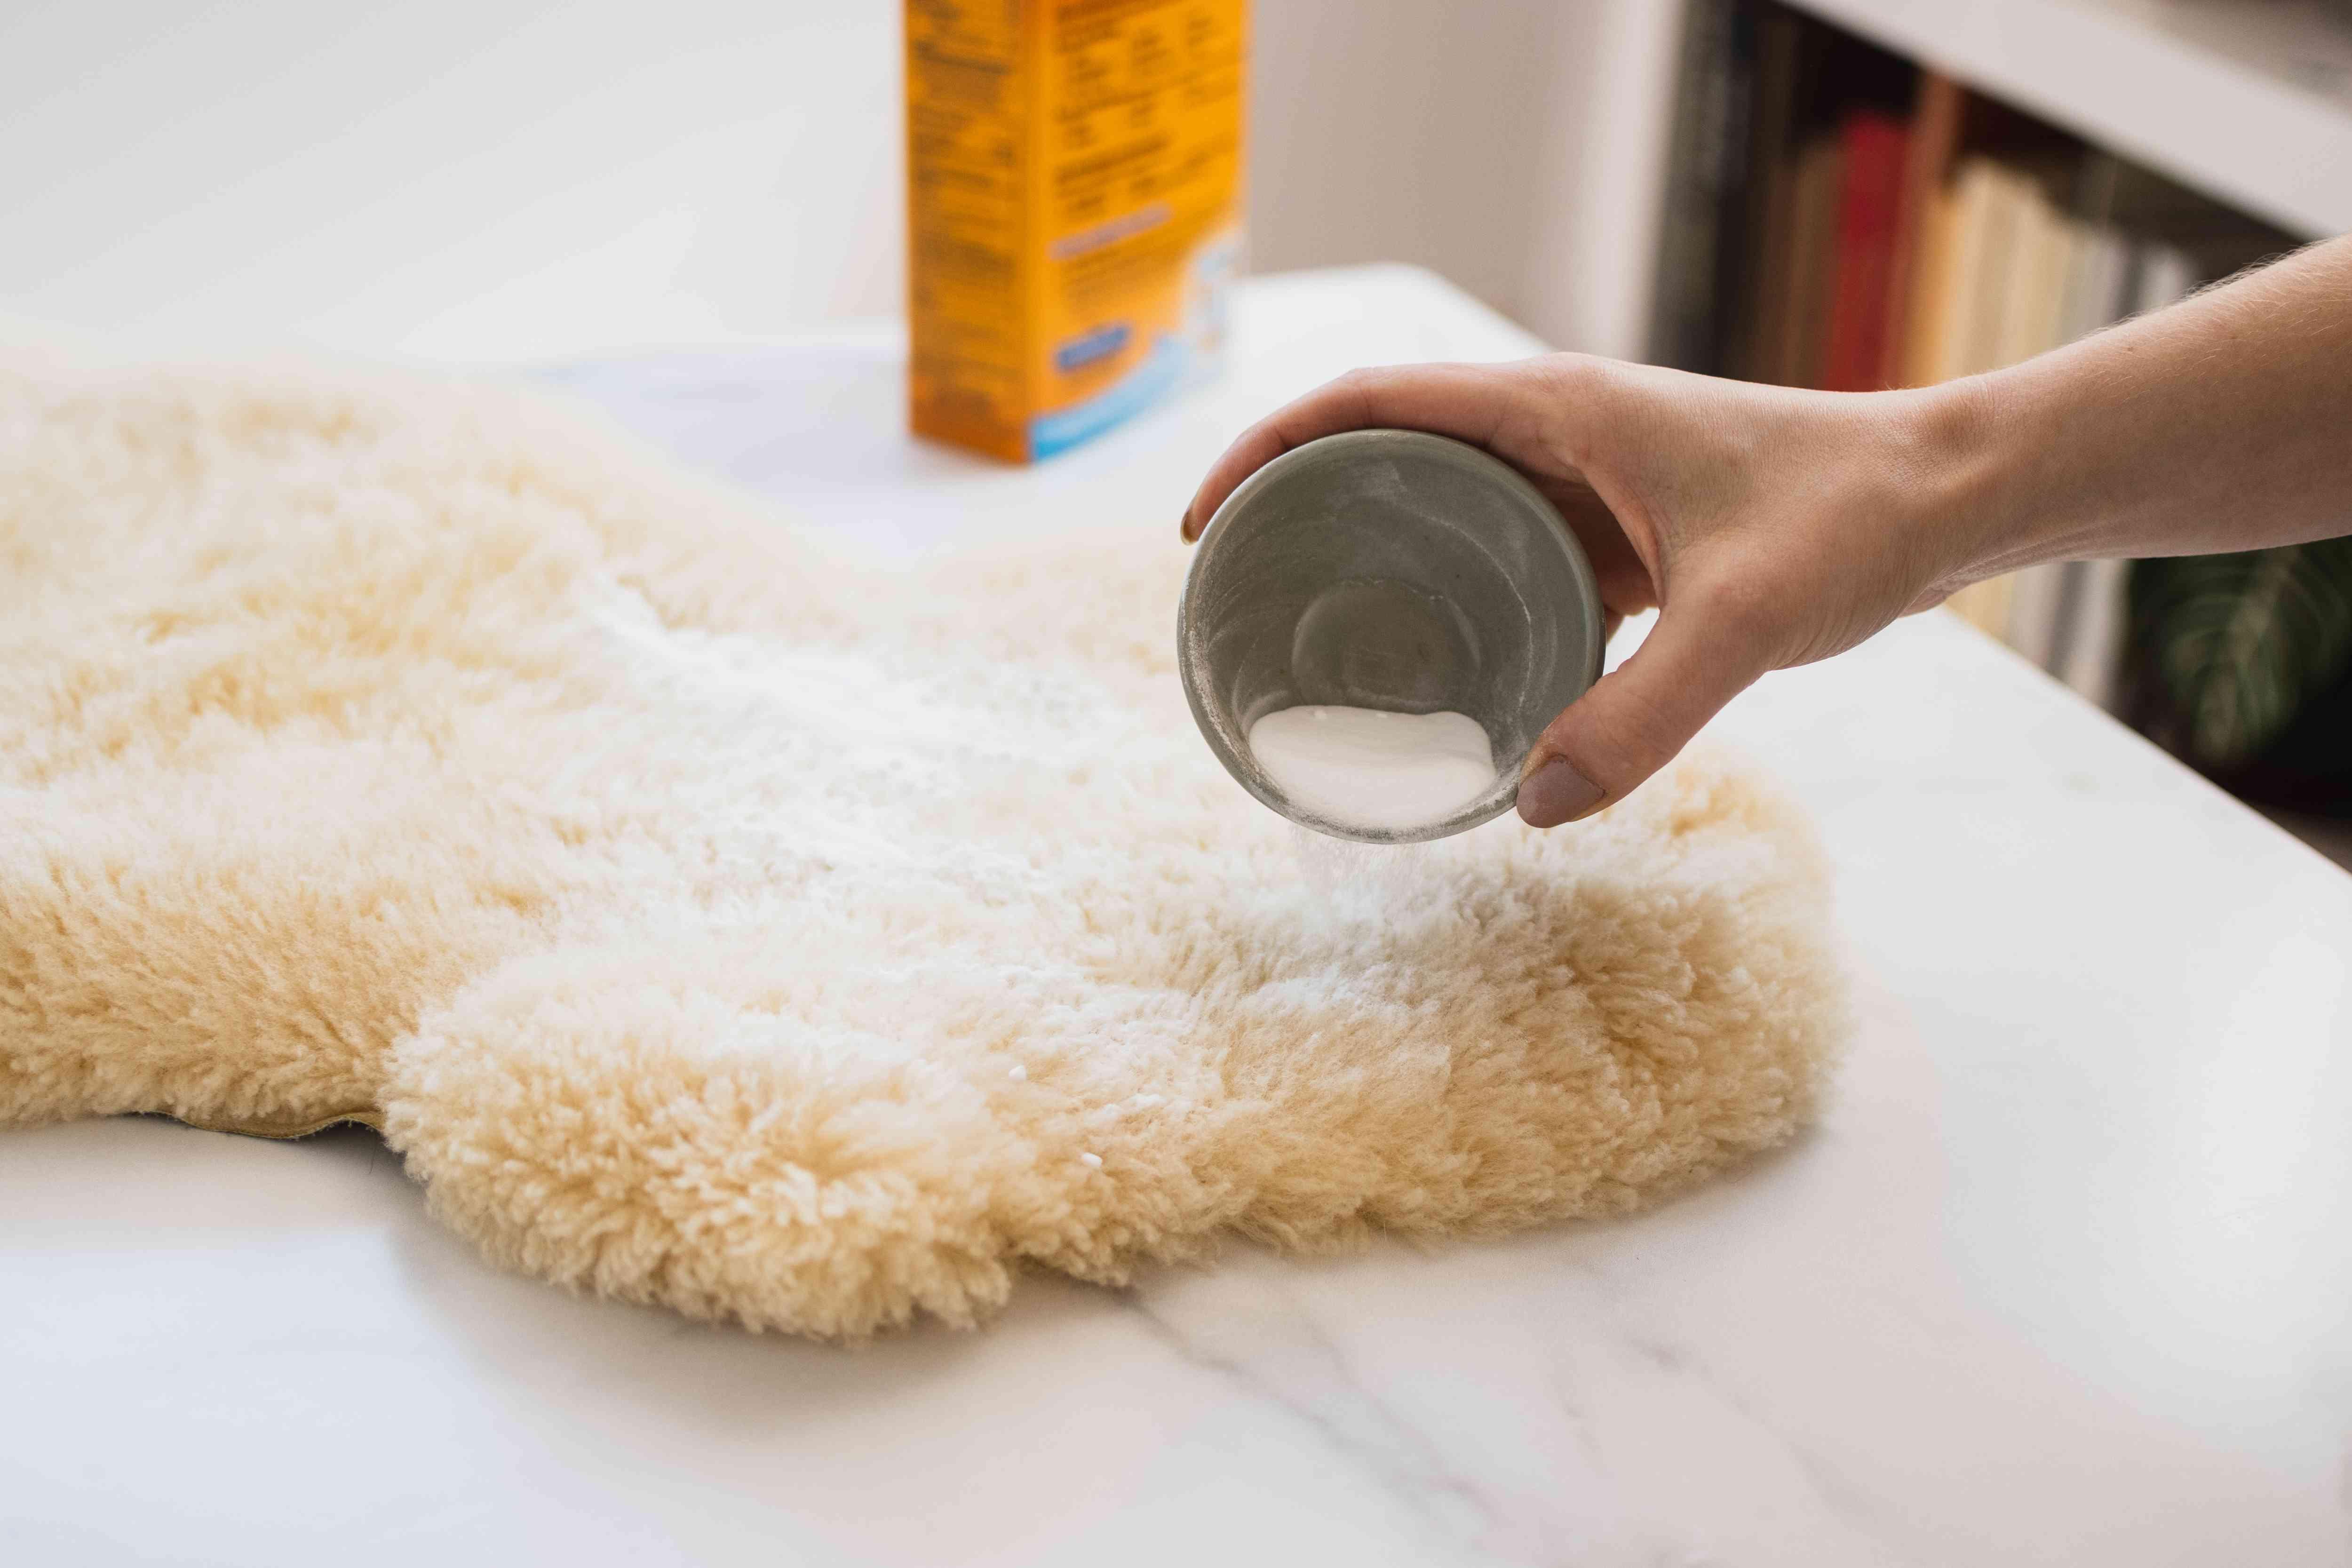 Baking soda poured on sheepskin rug to remove odors